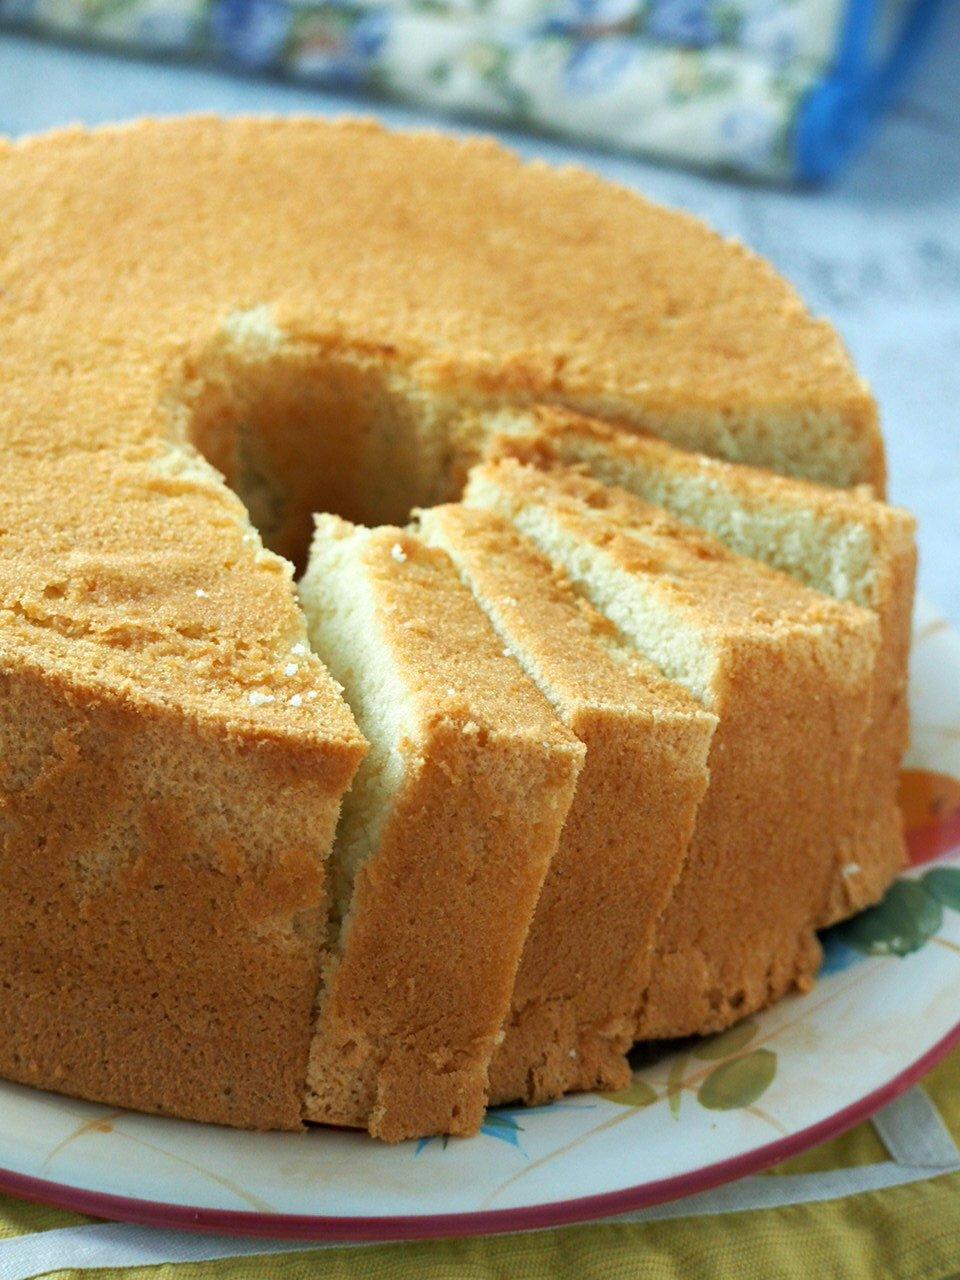 Closer shot of vanilla chiffon cake.